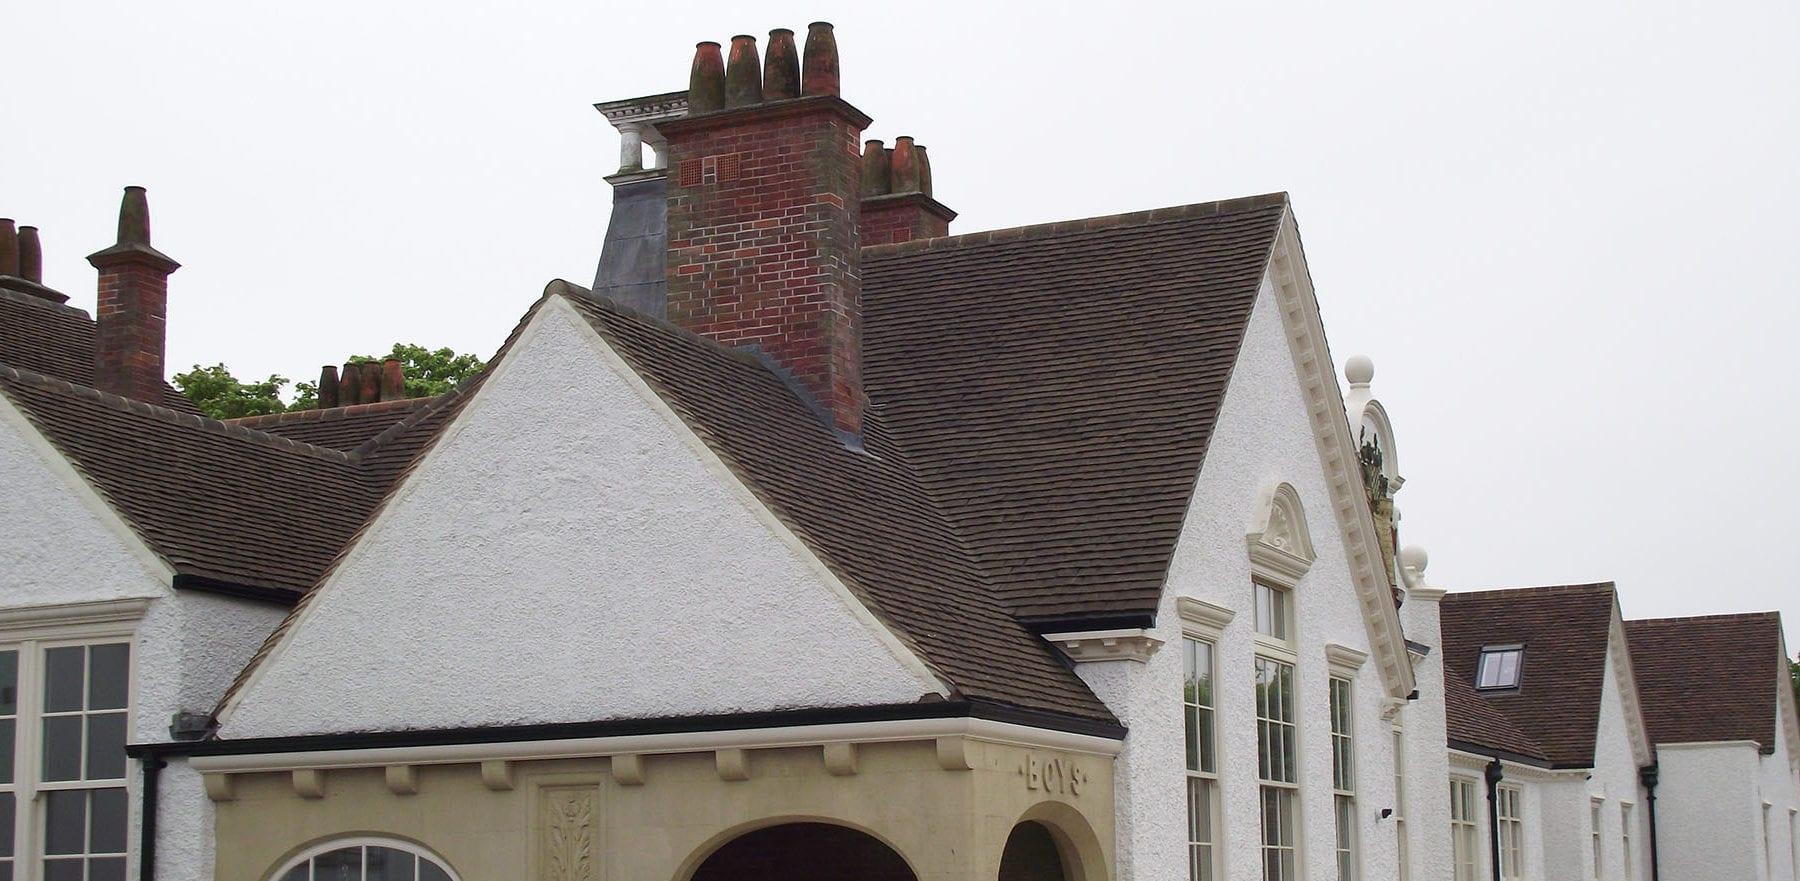 Lifestiles - Handmade Restoration Clay Roof Tiles - Redhill, England 6